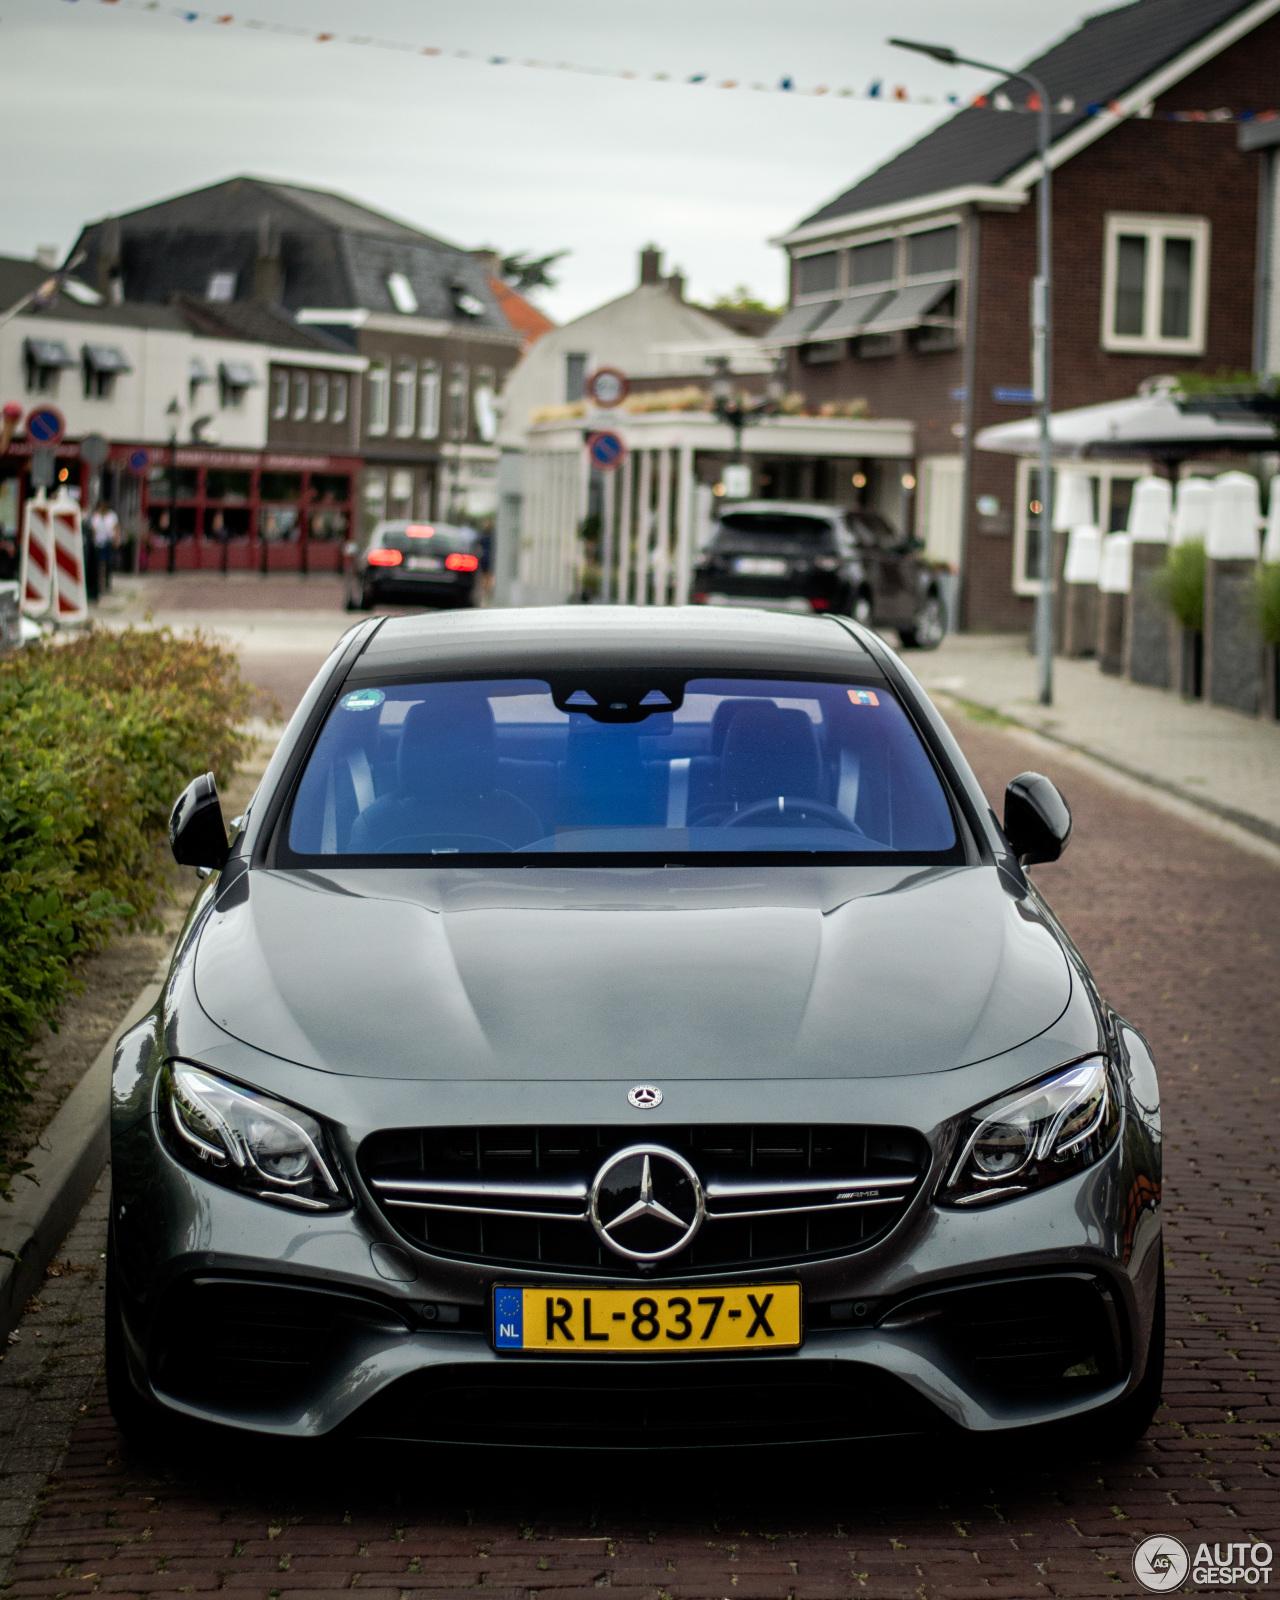 2018 Mercedes Amg E 63 S 4matic Sedan White Road: Mercedes-AMG E 63 S W213